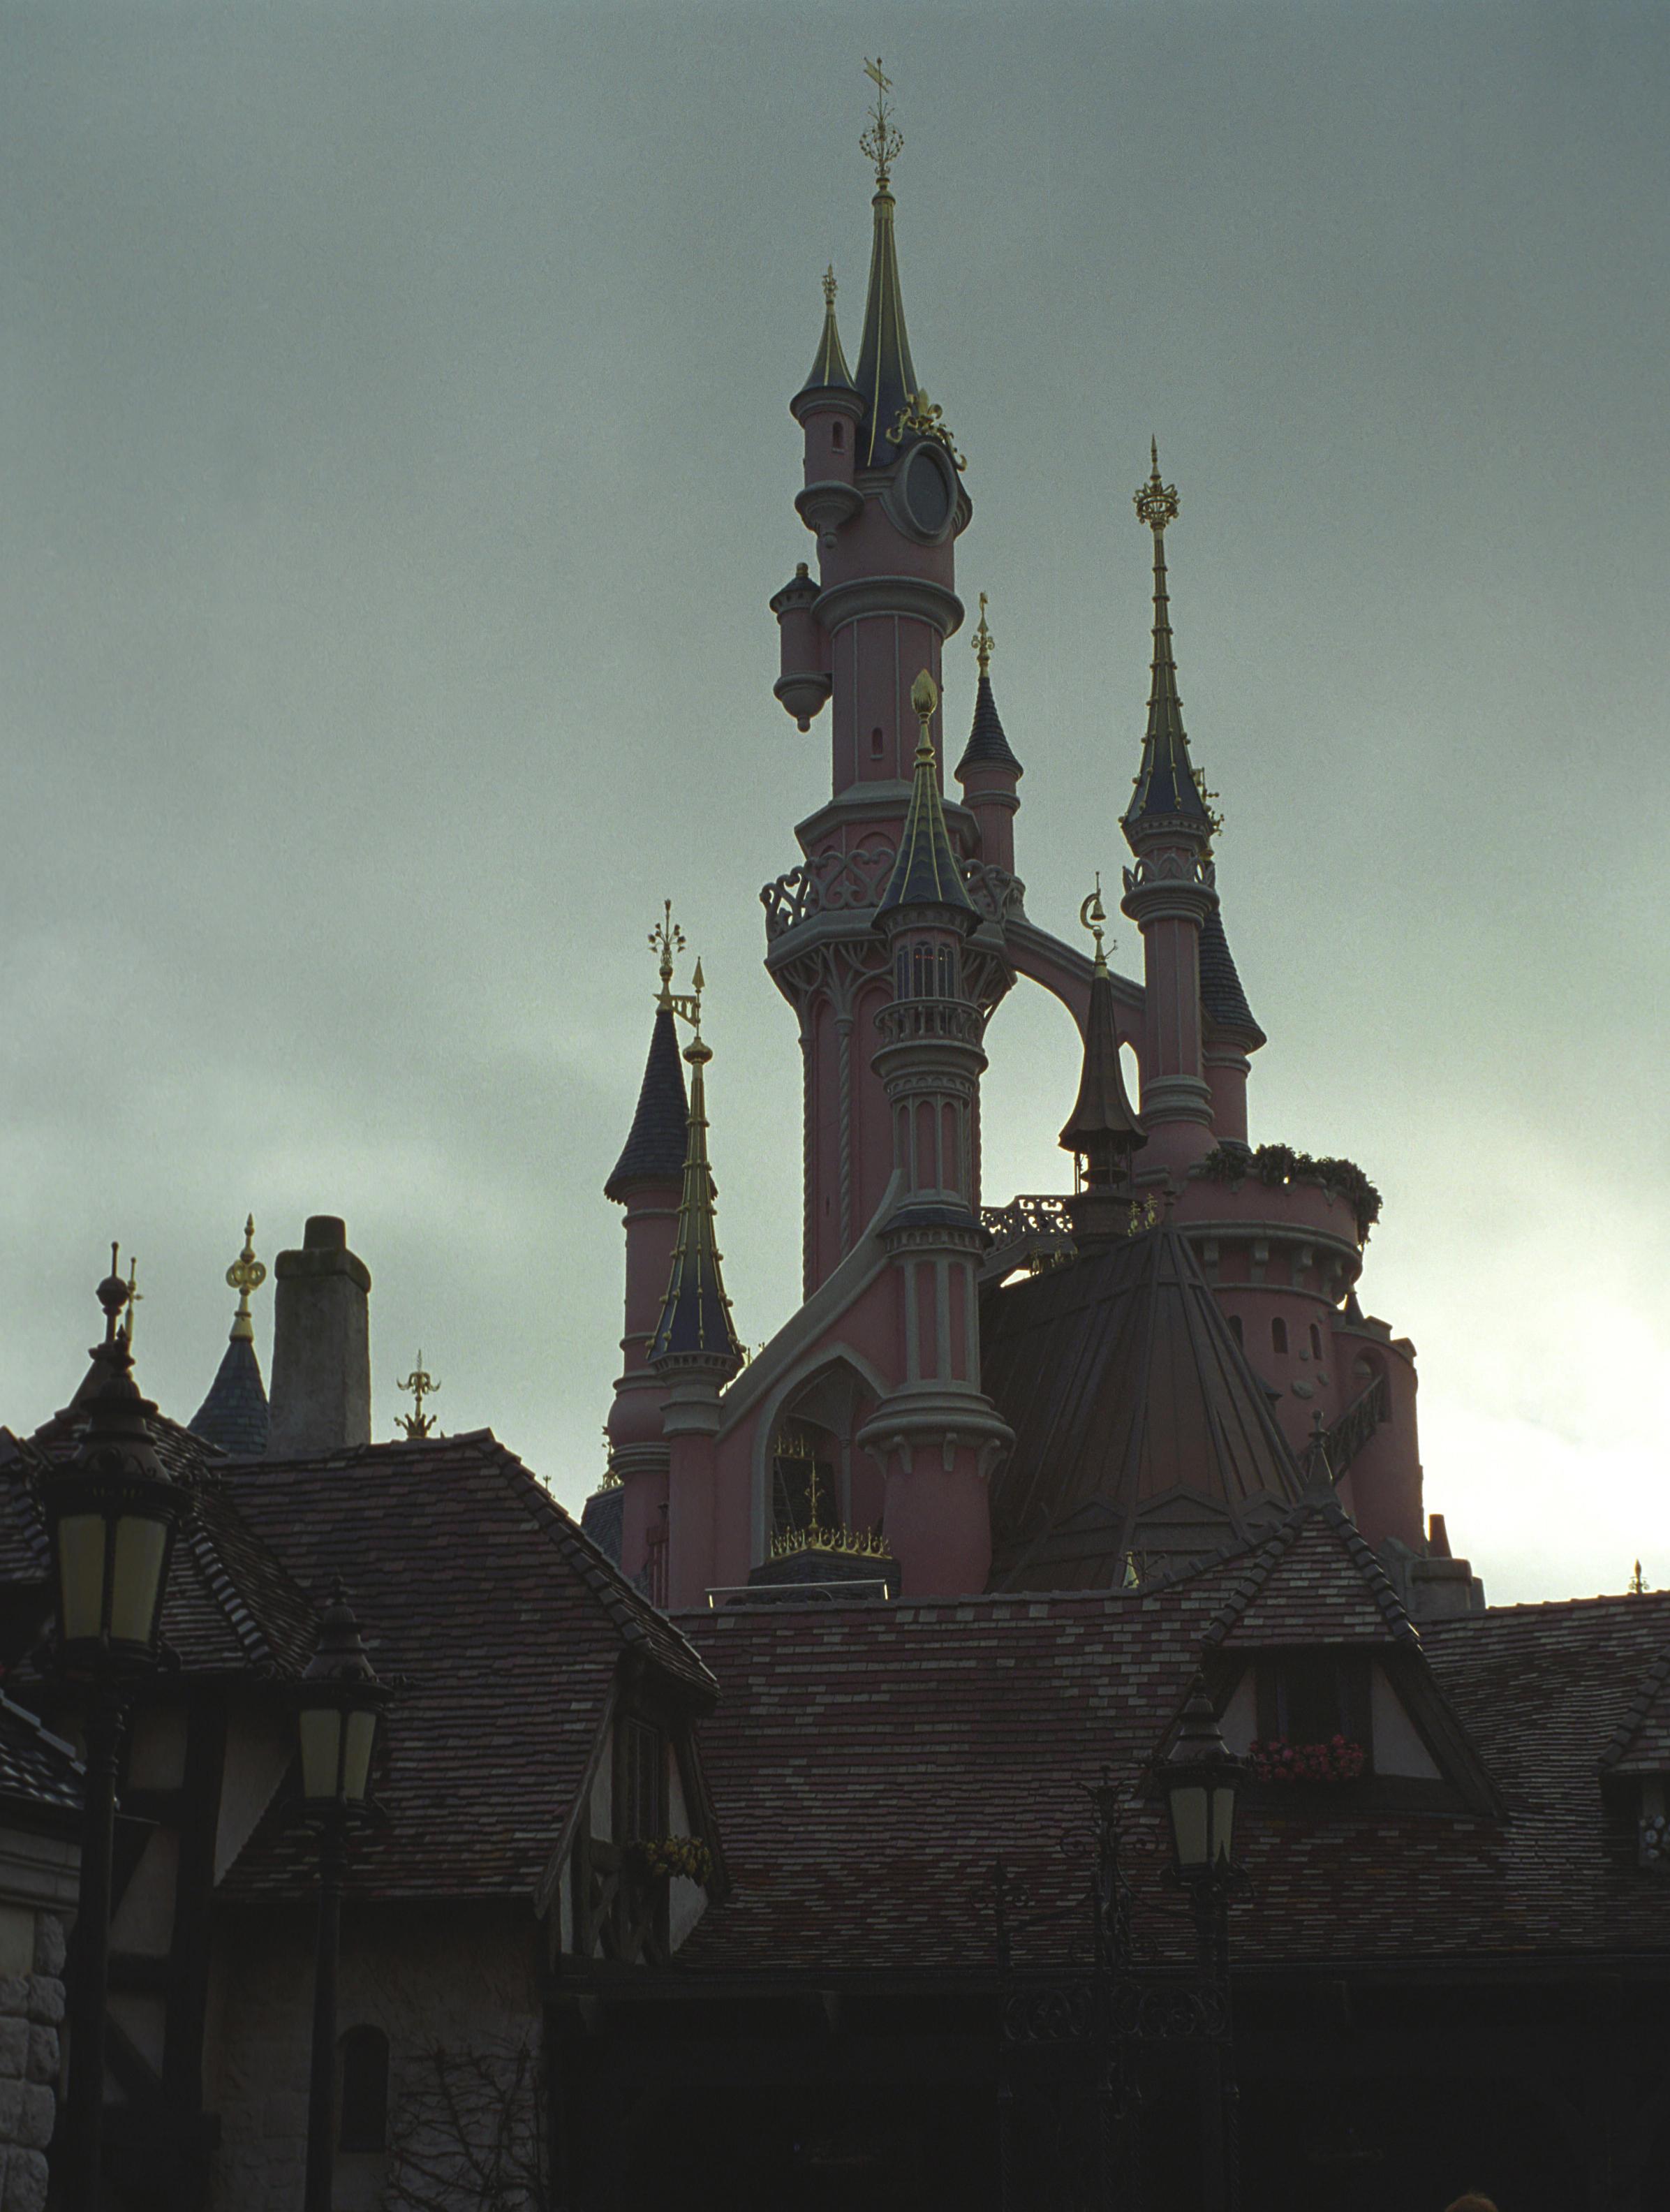 Sleeping Beautys castle by Rivendell-PhotoStock